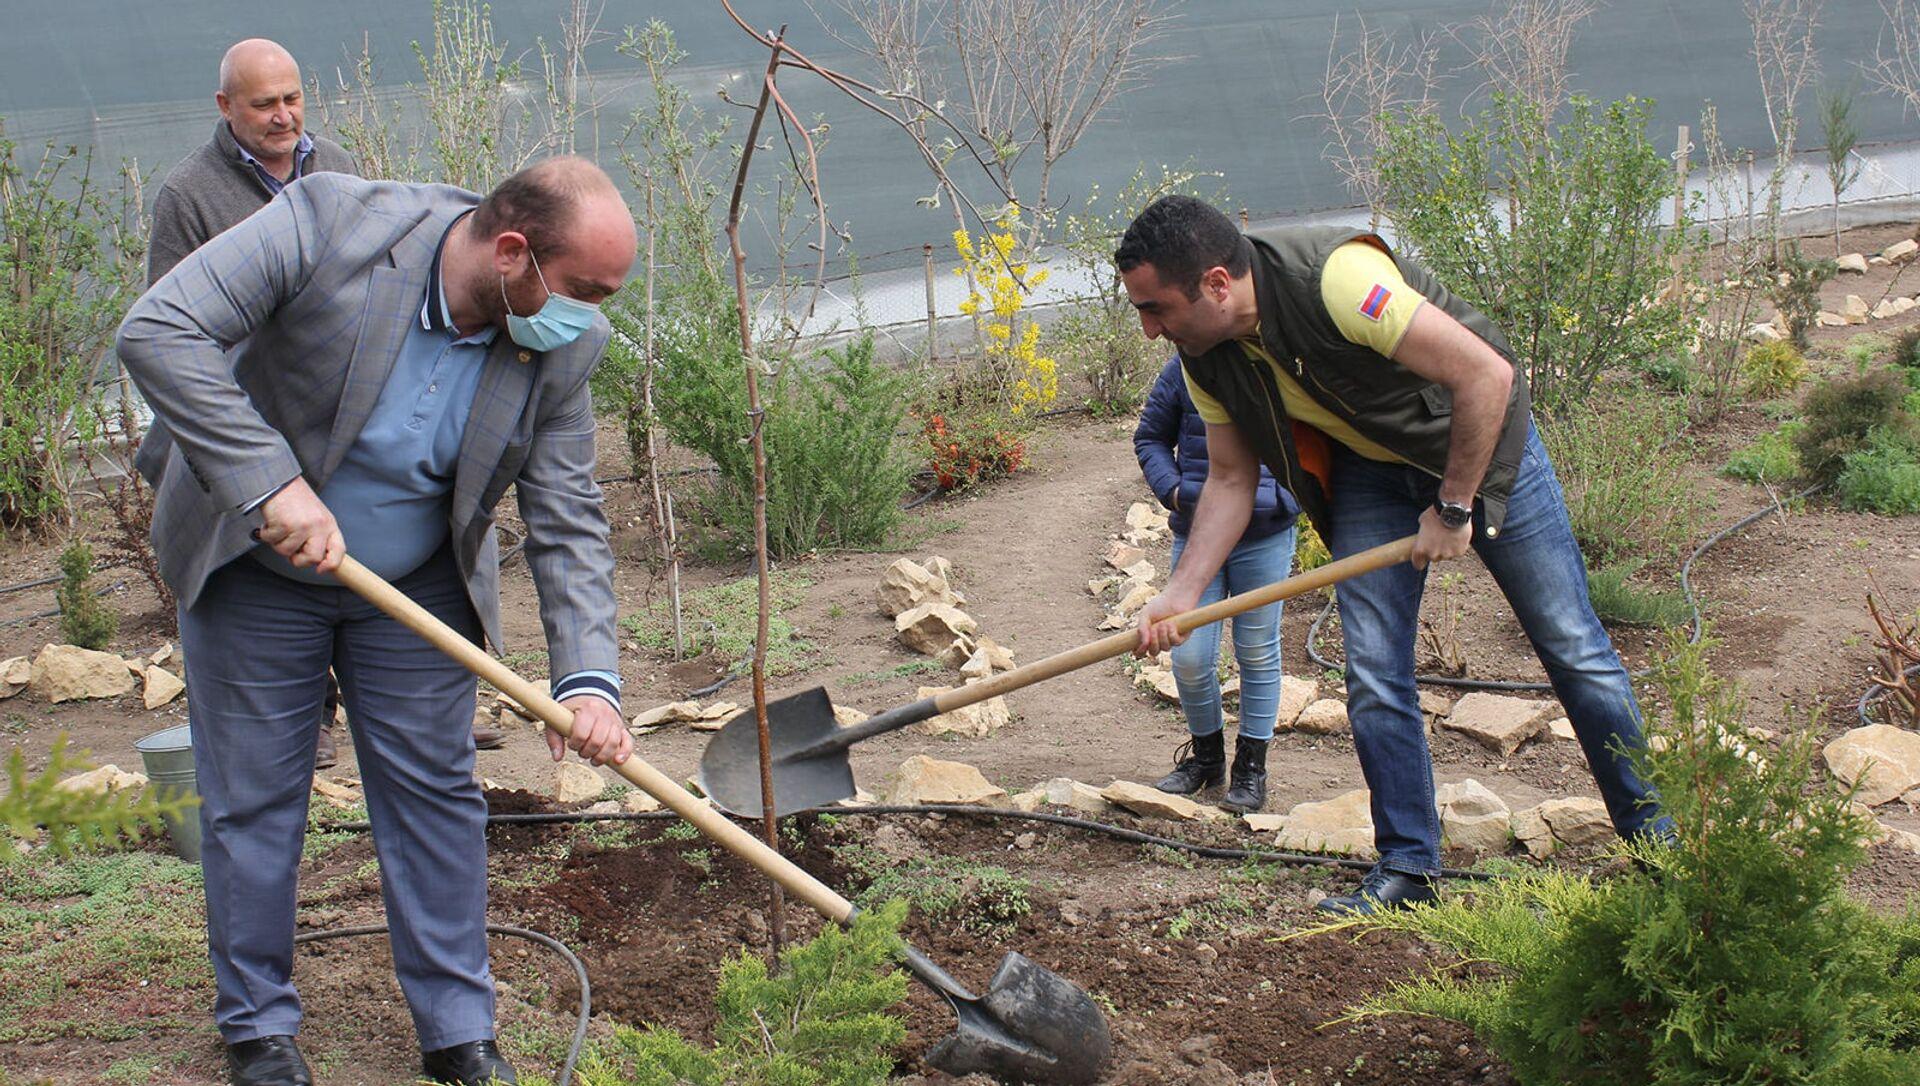 Министр окружающей среды Романос Петросян стартовал инициативу 10 миллионов деревьев (10 апреля 2021). Арагацотн - Sputnik Արմենիա, 1920, 10.04.2021